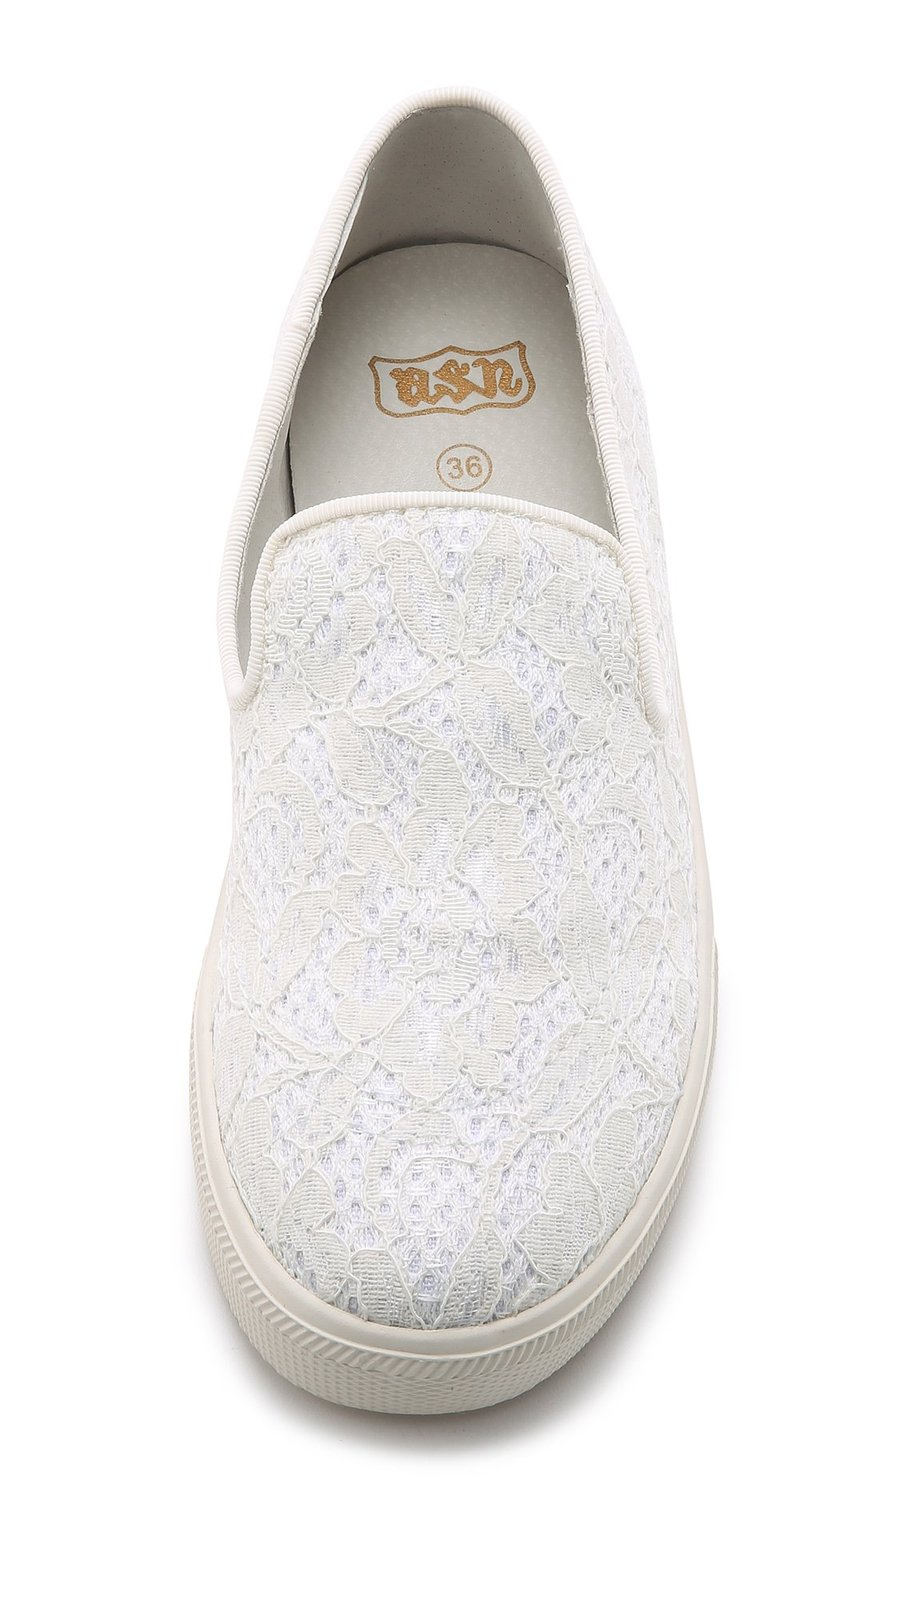 Ash Women's Illusion Lace Slip On Sneakers, Off White, 38 EU (8.5 B(M) US Women)